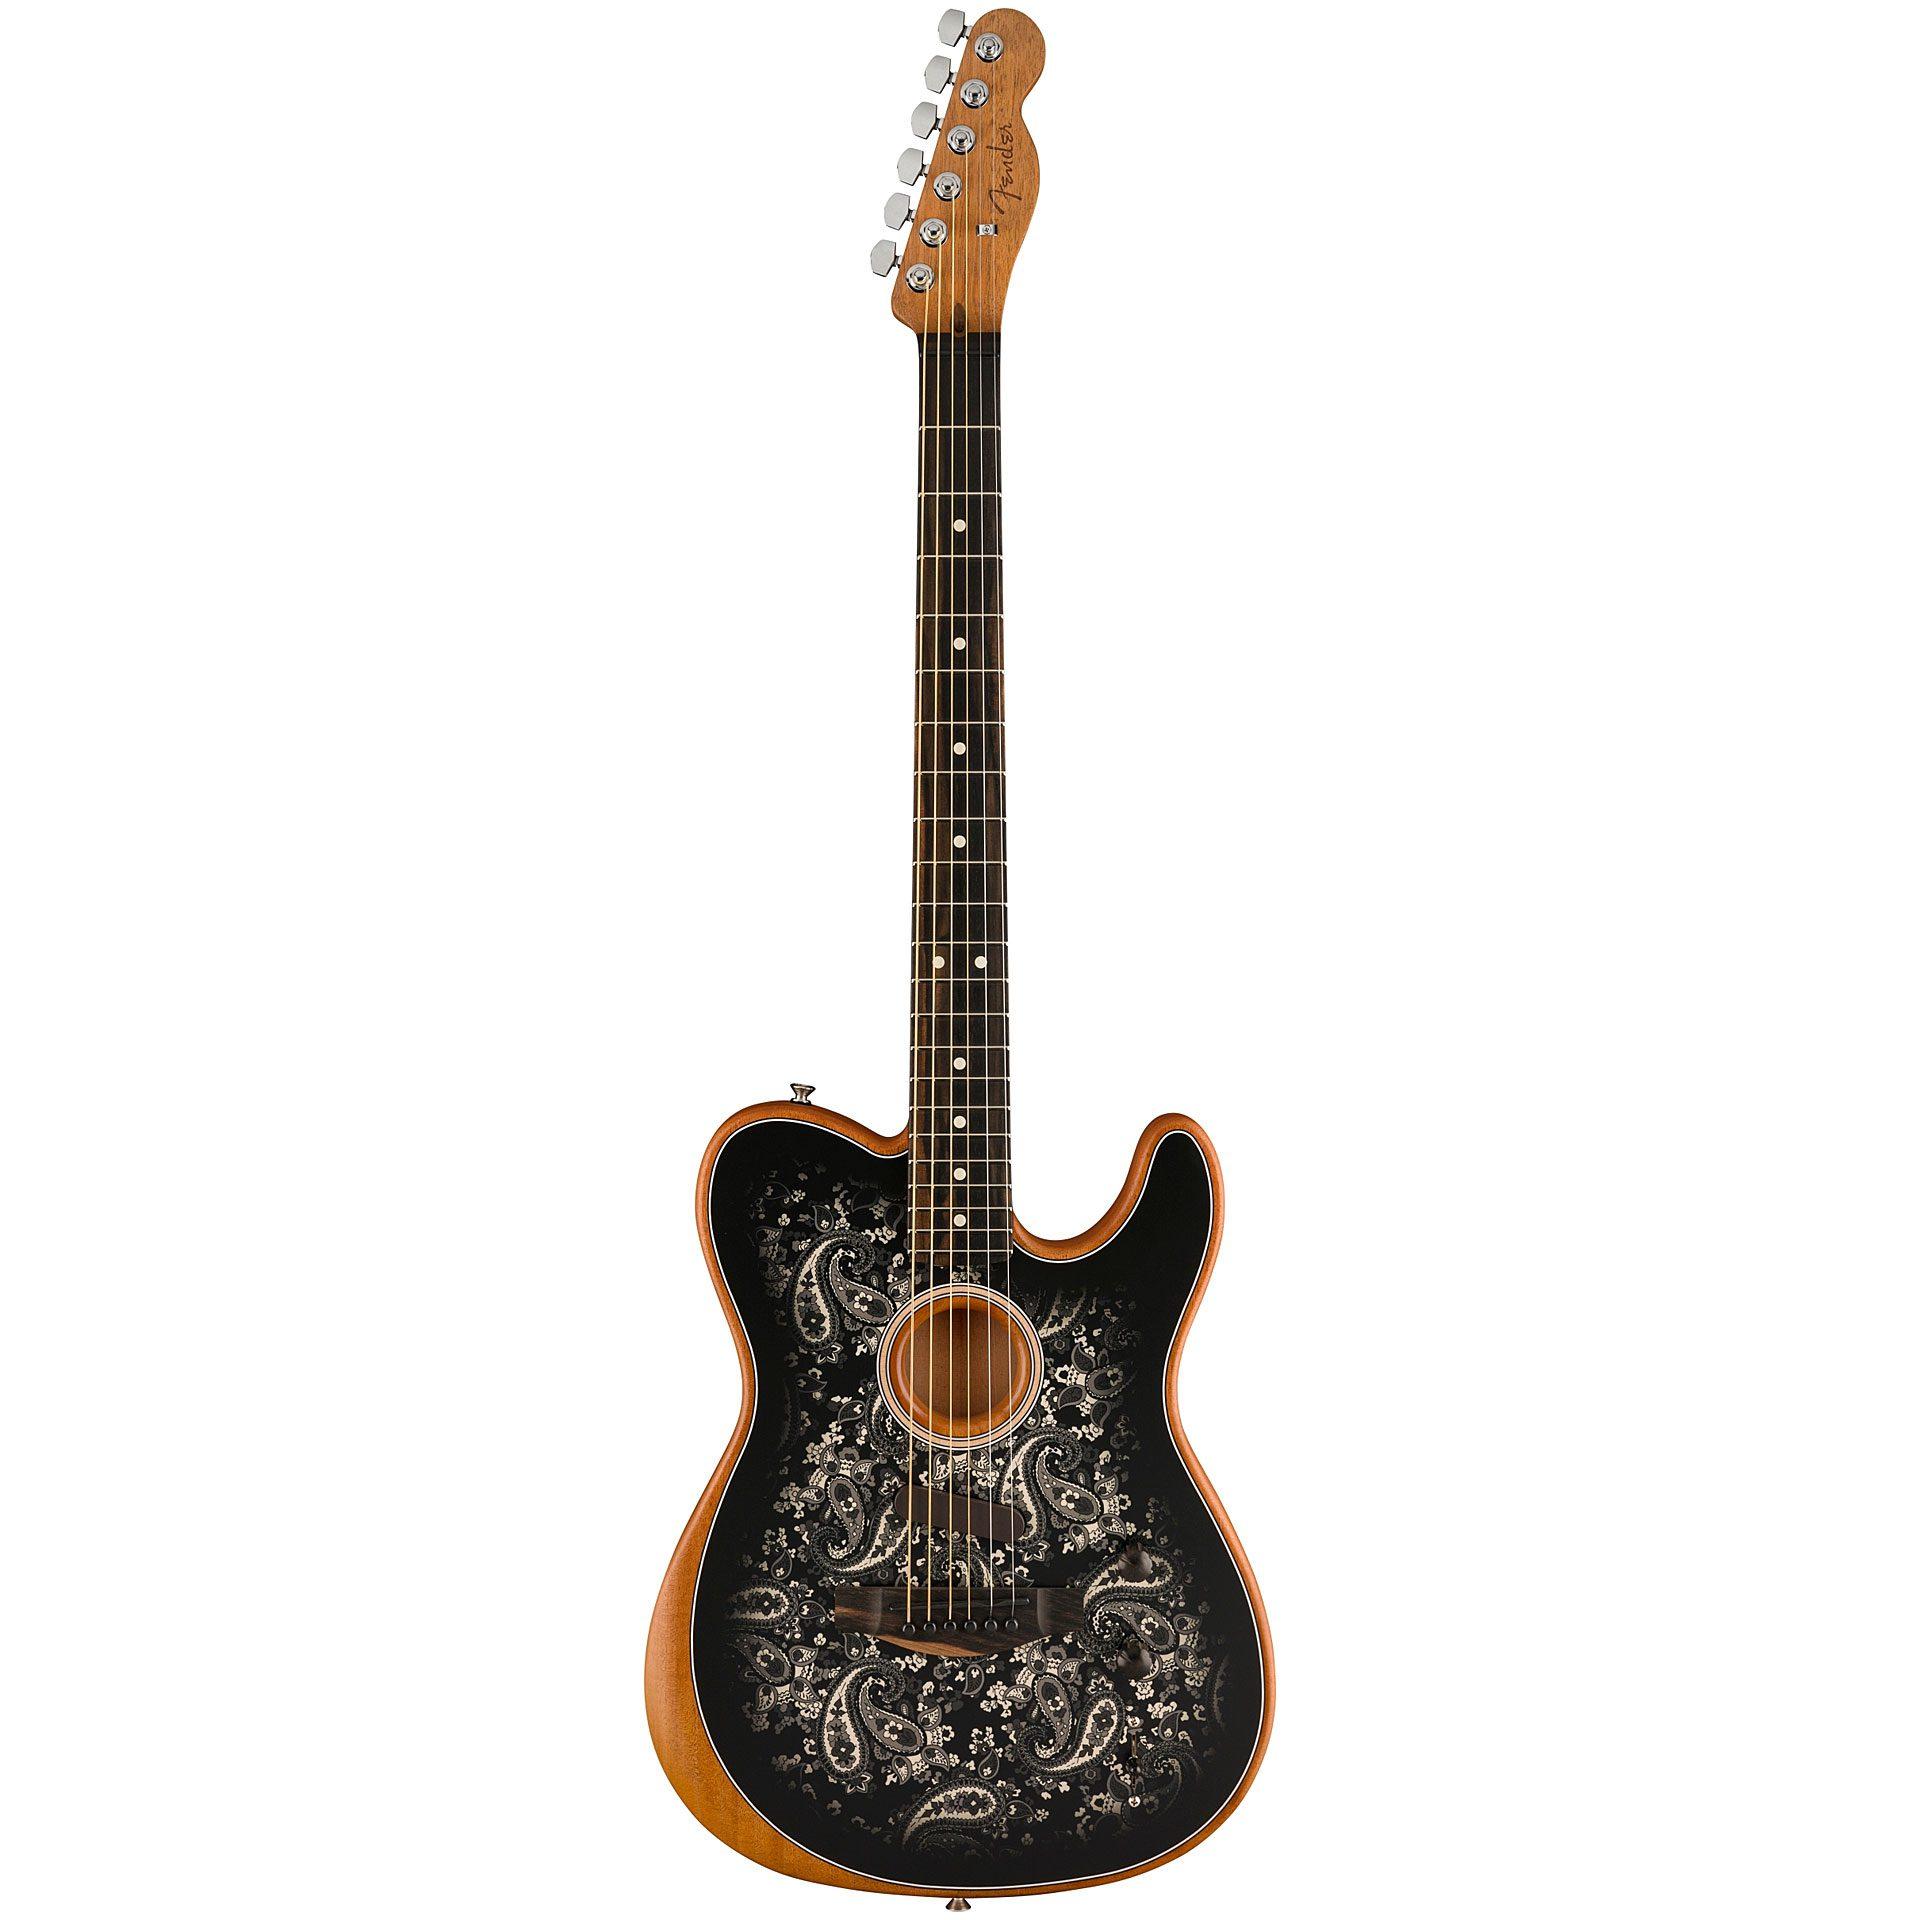 Fender Acoustasonic Tele Black Paisley ltd. Edition